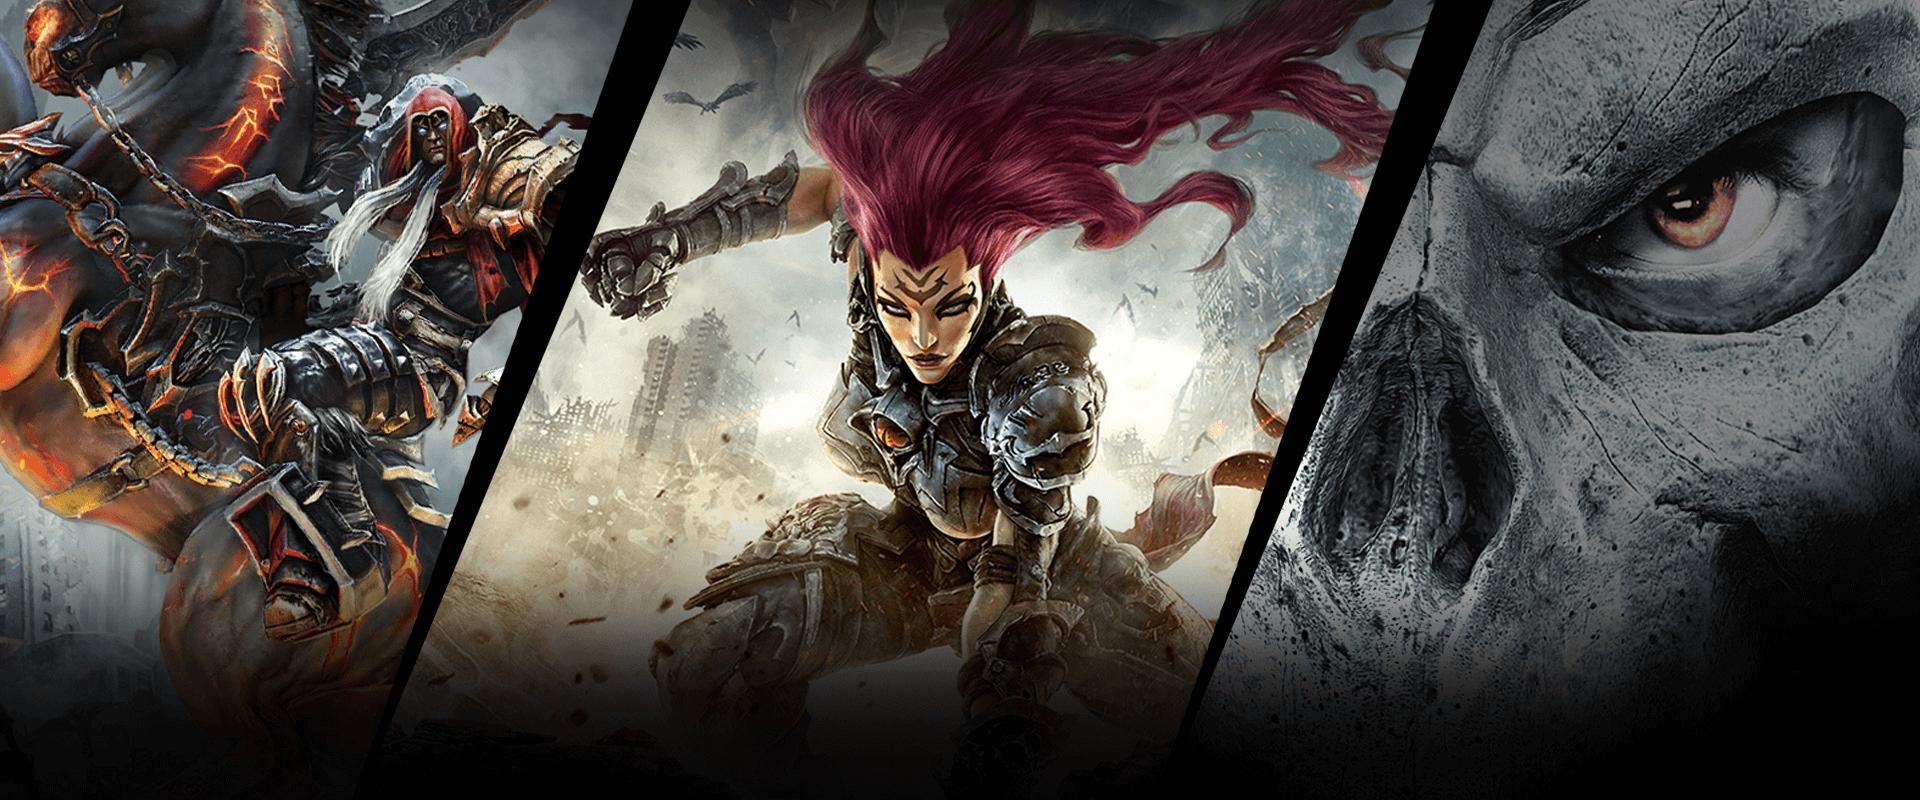 Darksiders: Fury's Collection - War and Death - Darksiders III